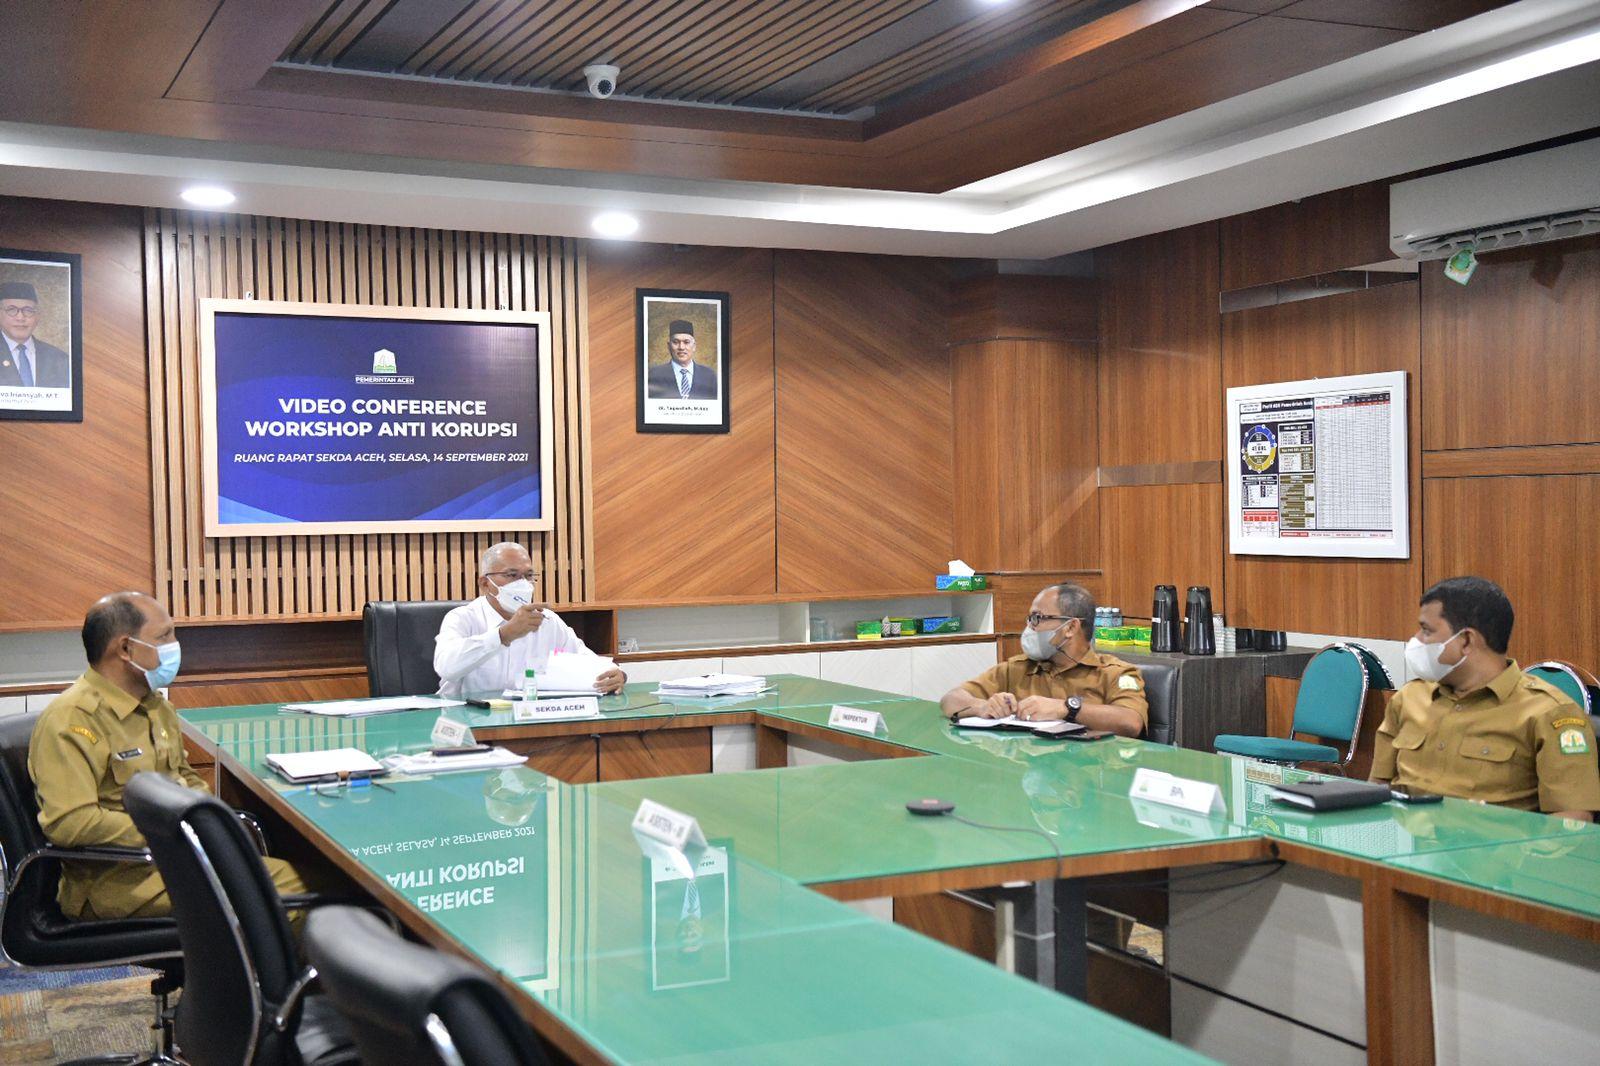 Ikut Workshop Anti Korupsi bersama BPK RI